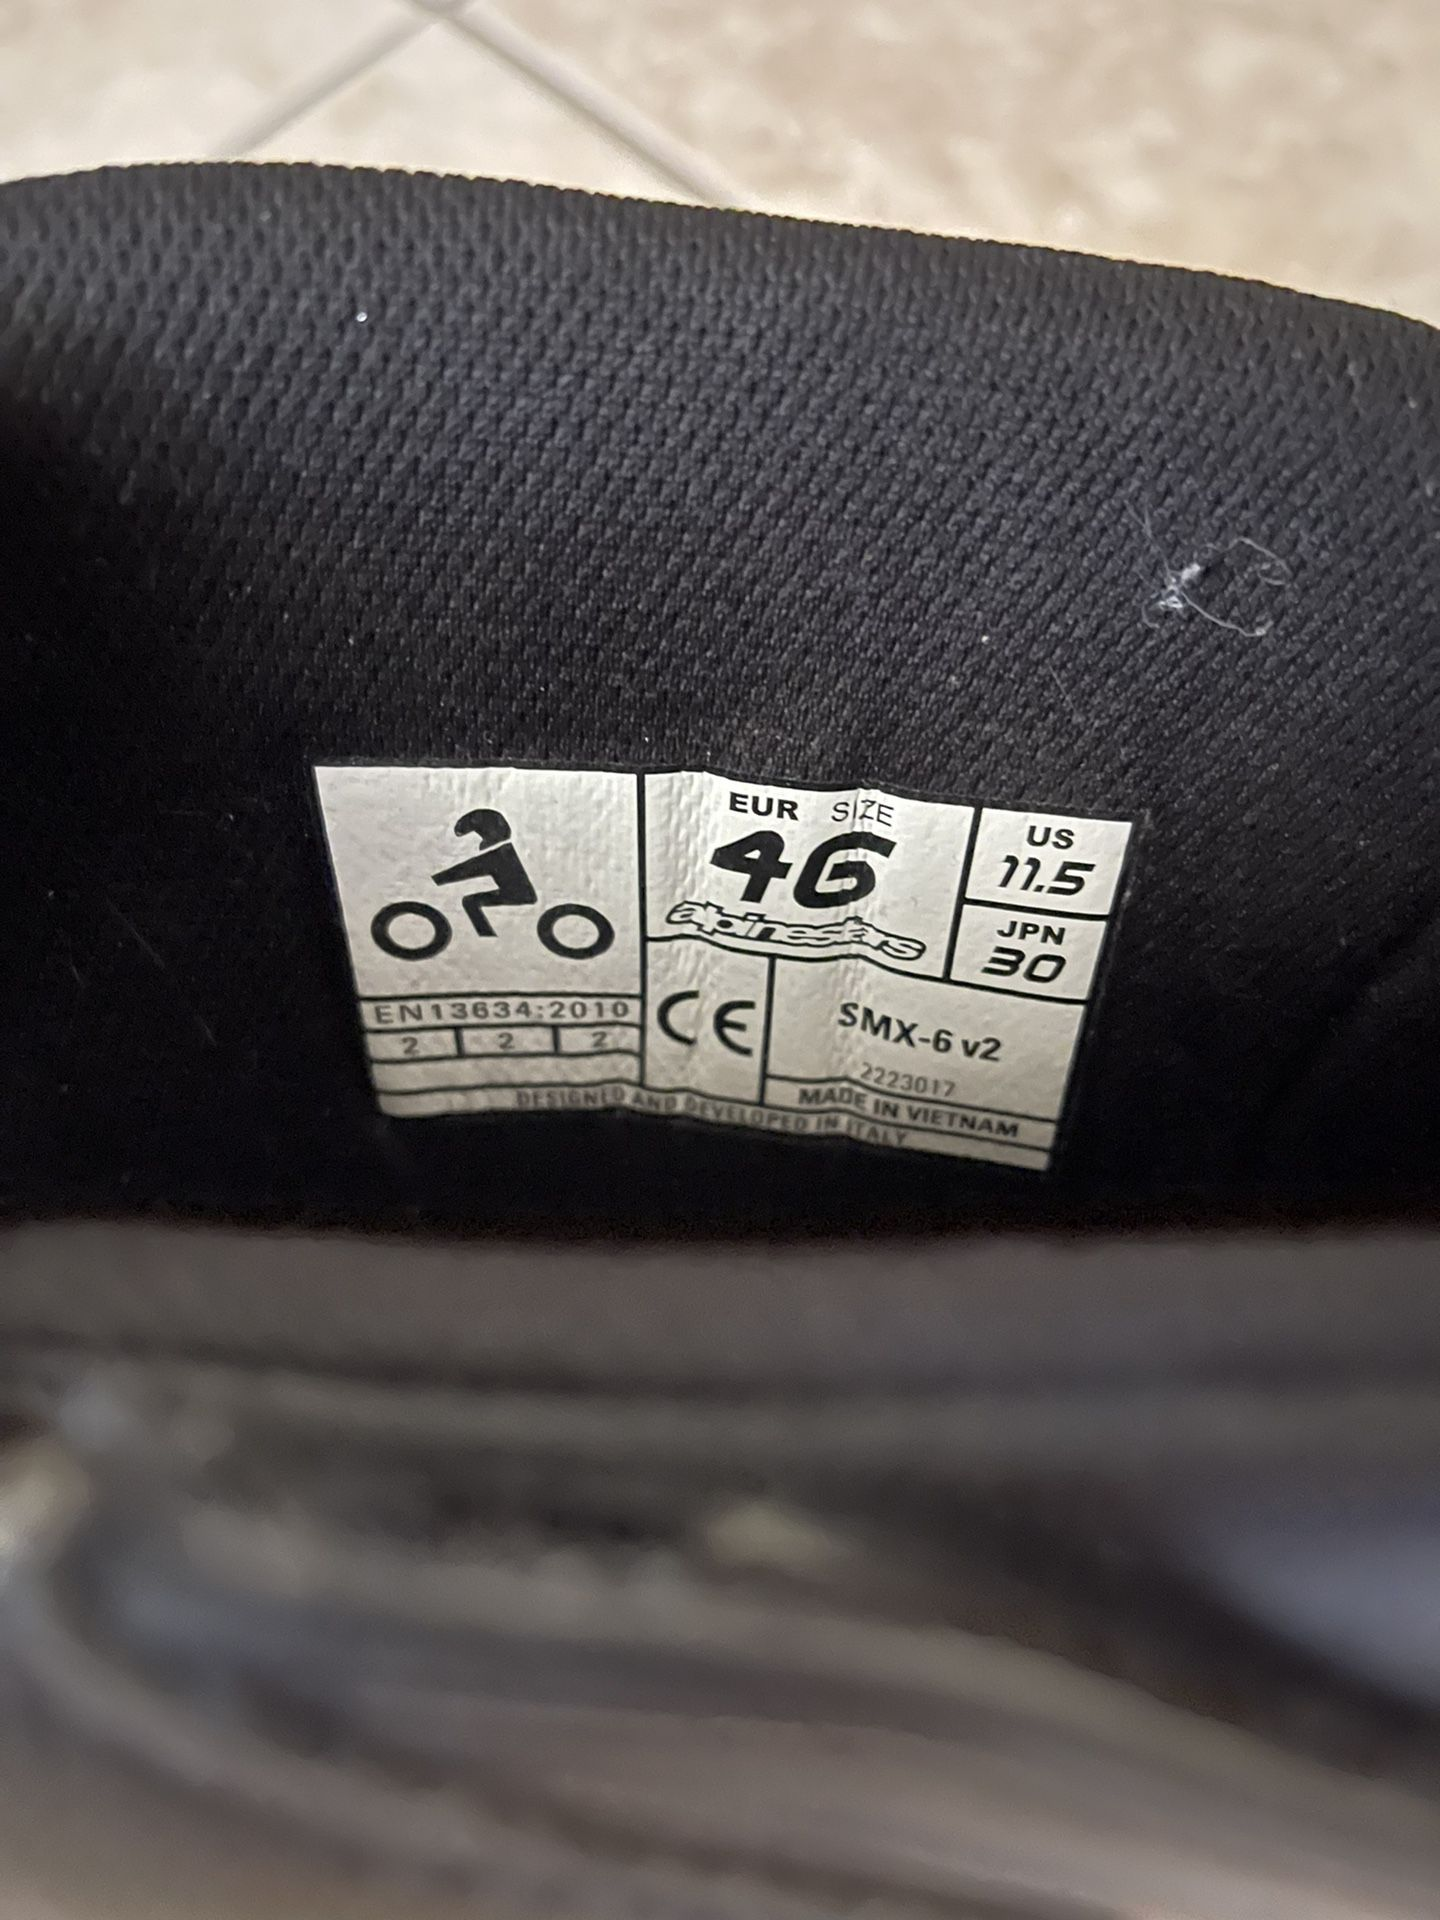 Alpine star SMX-6 V2 Motorcycle boots